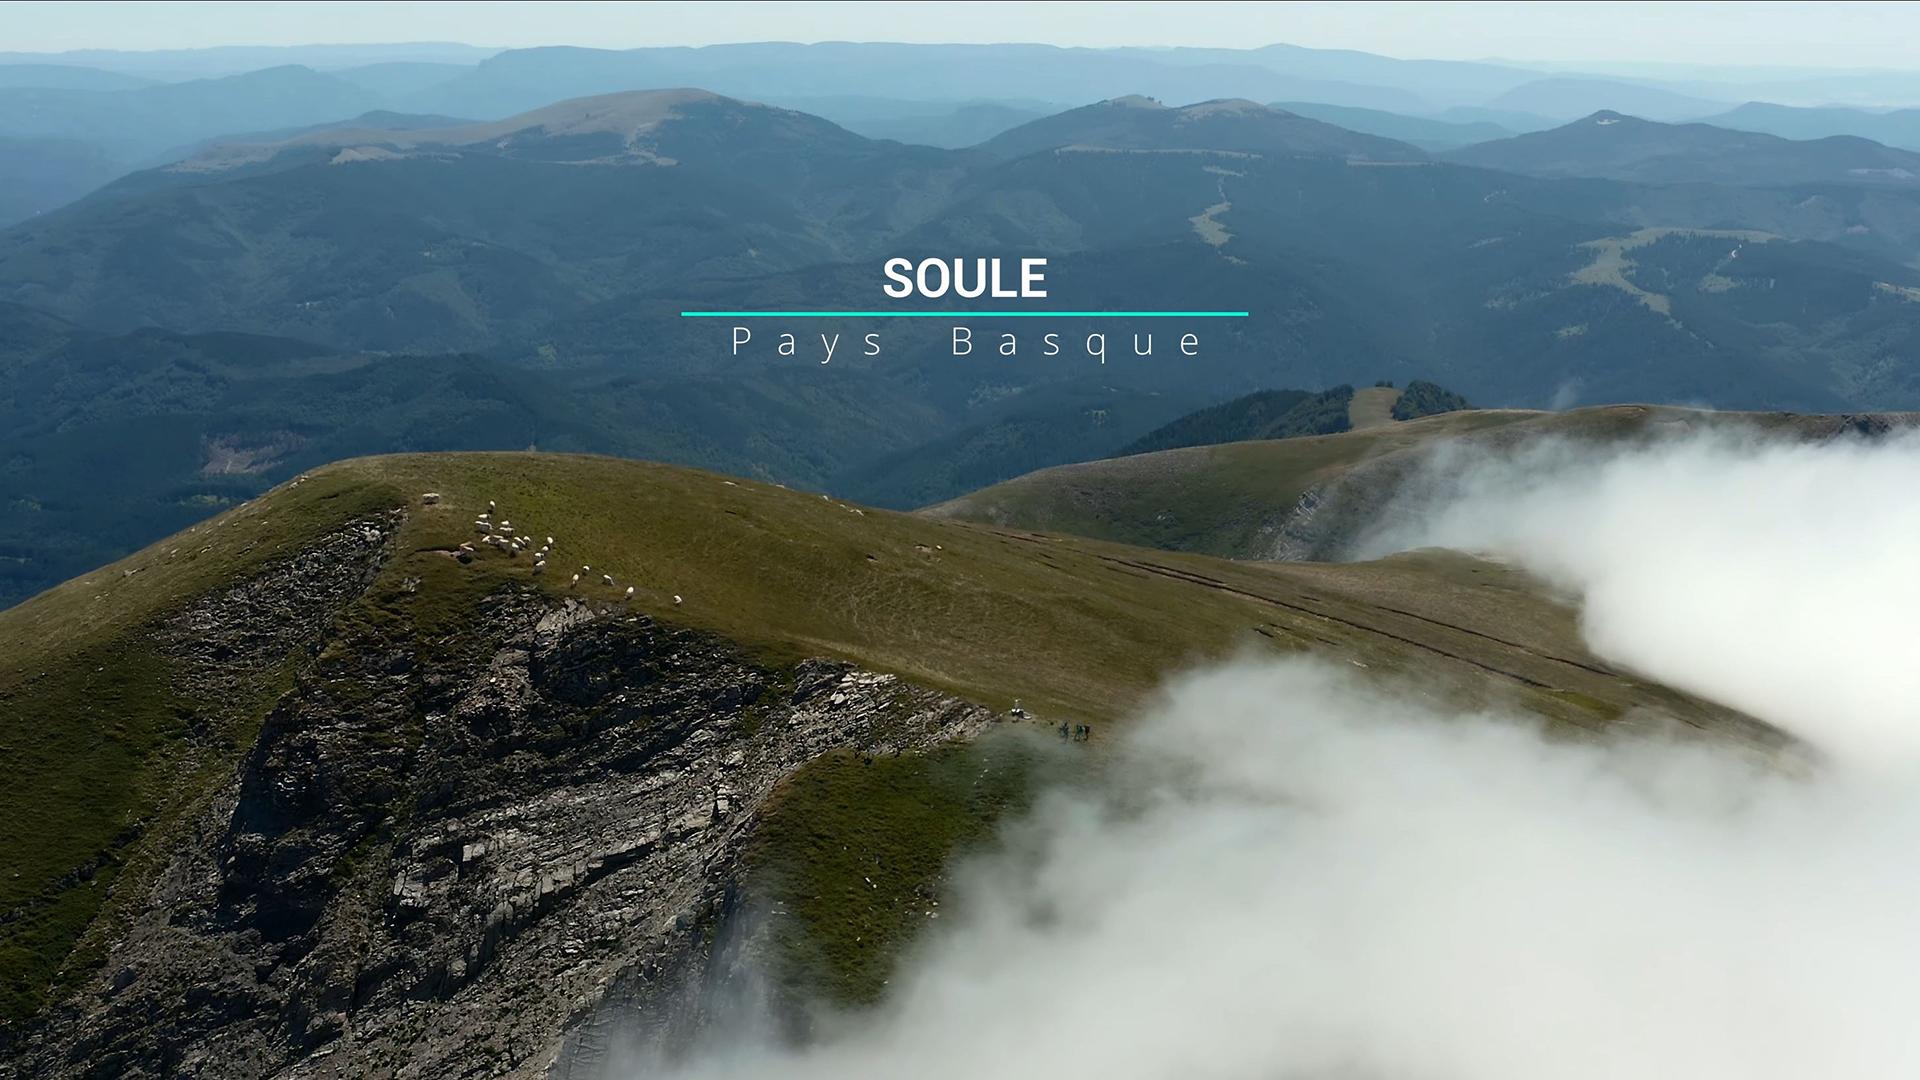 PYRÉNÉES 1 - Pays Basque - DUNE Video